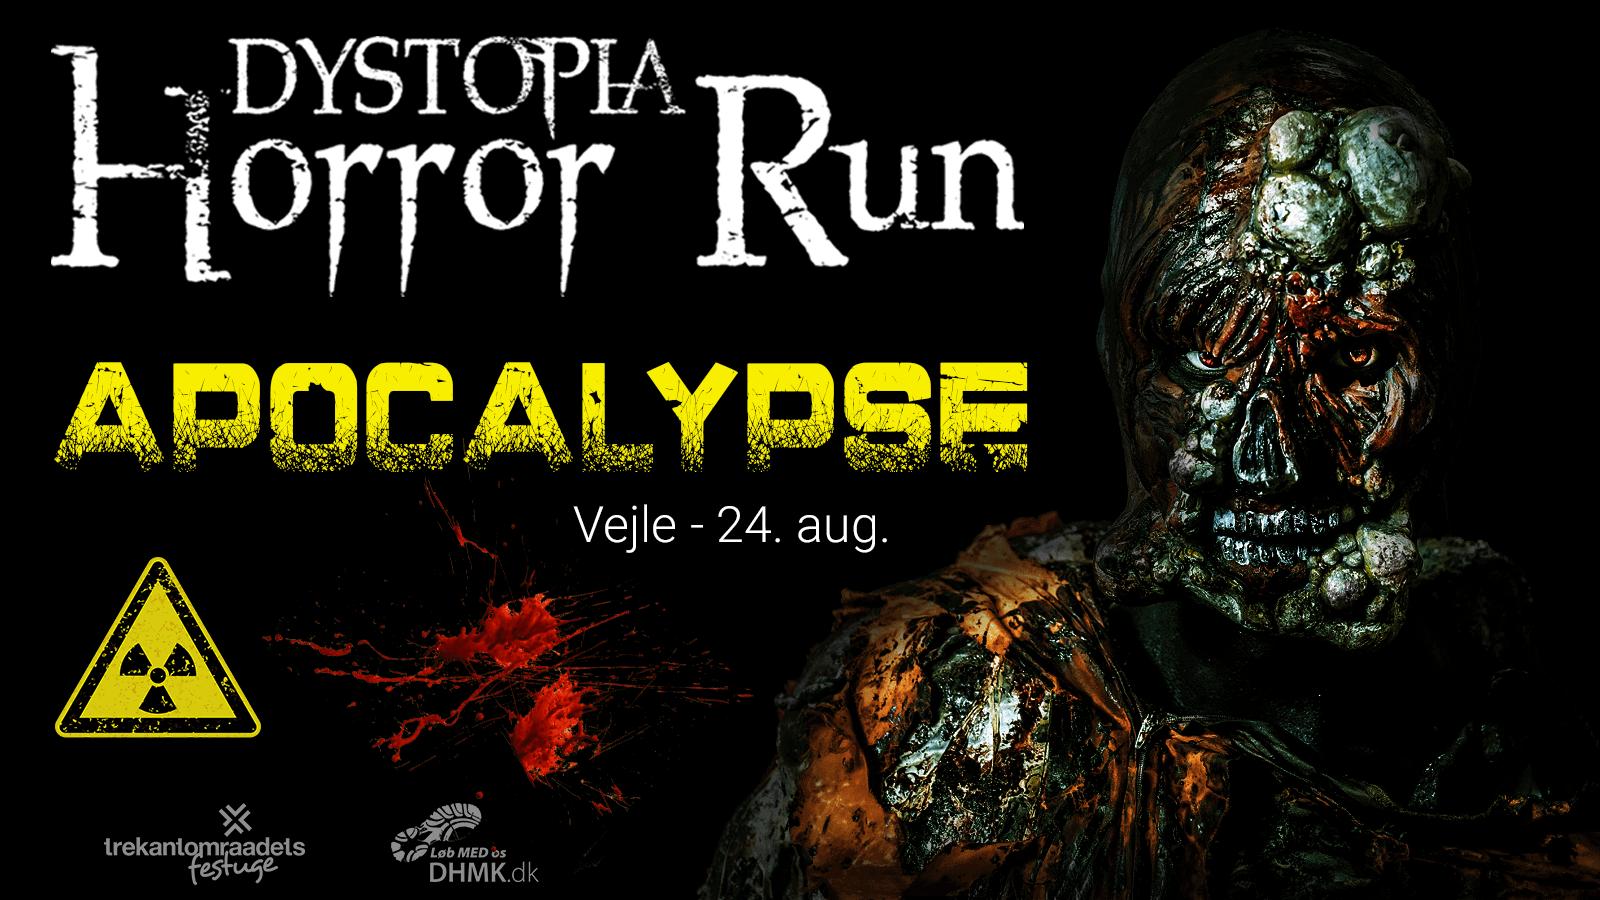 Dystopia Horror Run APOCALYPSE Event